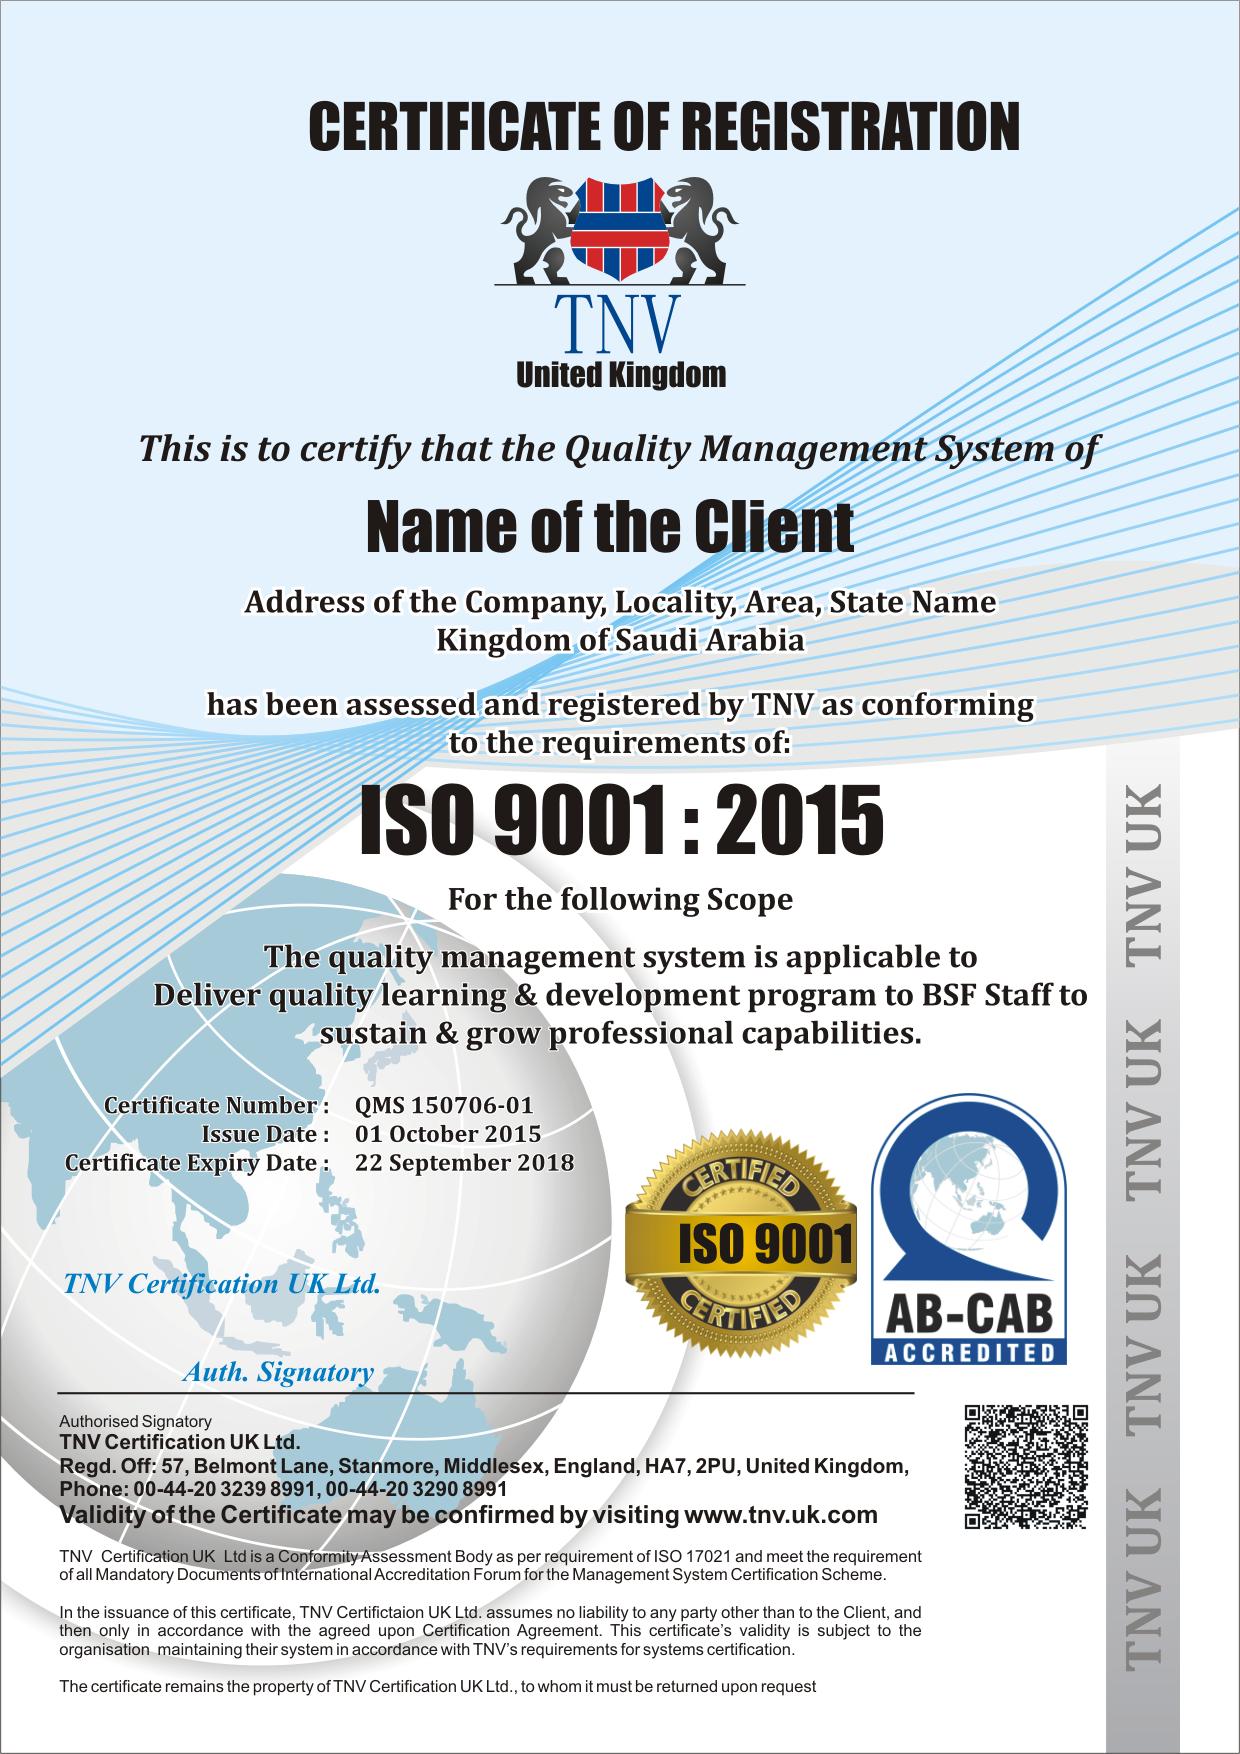 iso 9001 certificate sample tnv qms gmp certificates templates ce haccp